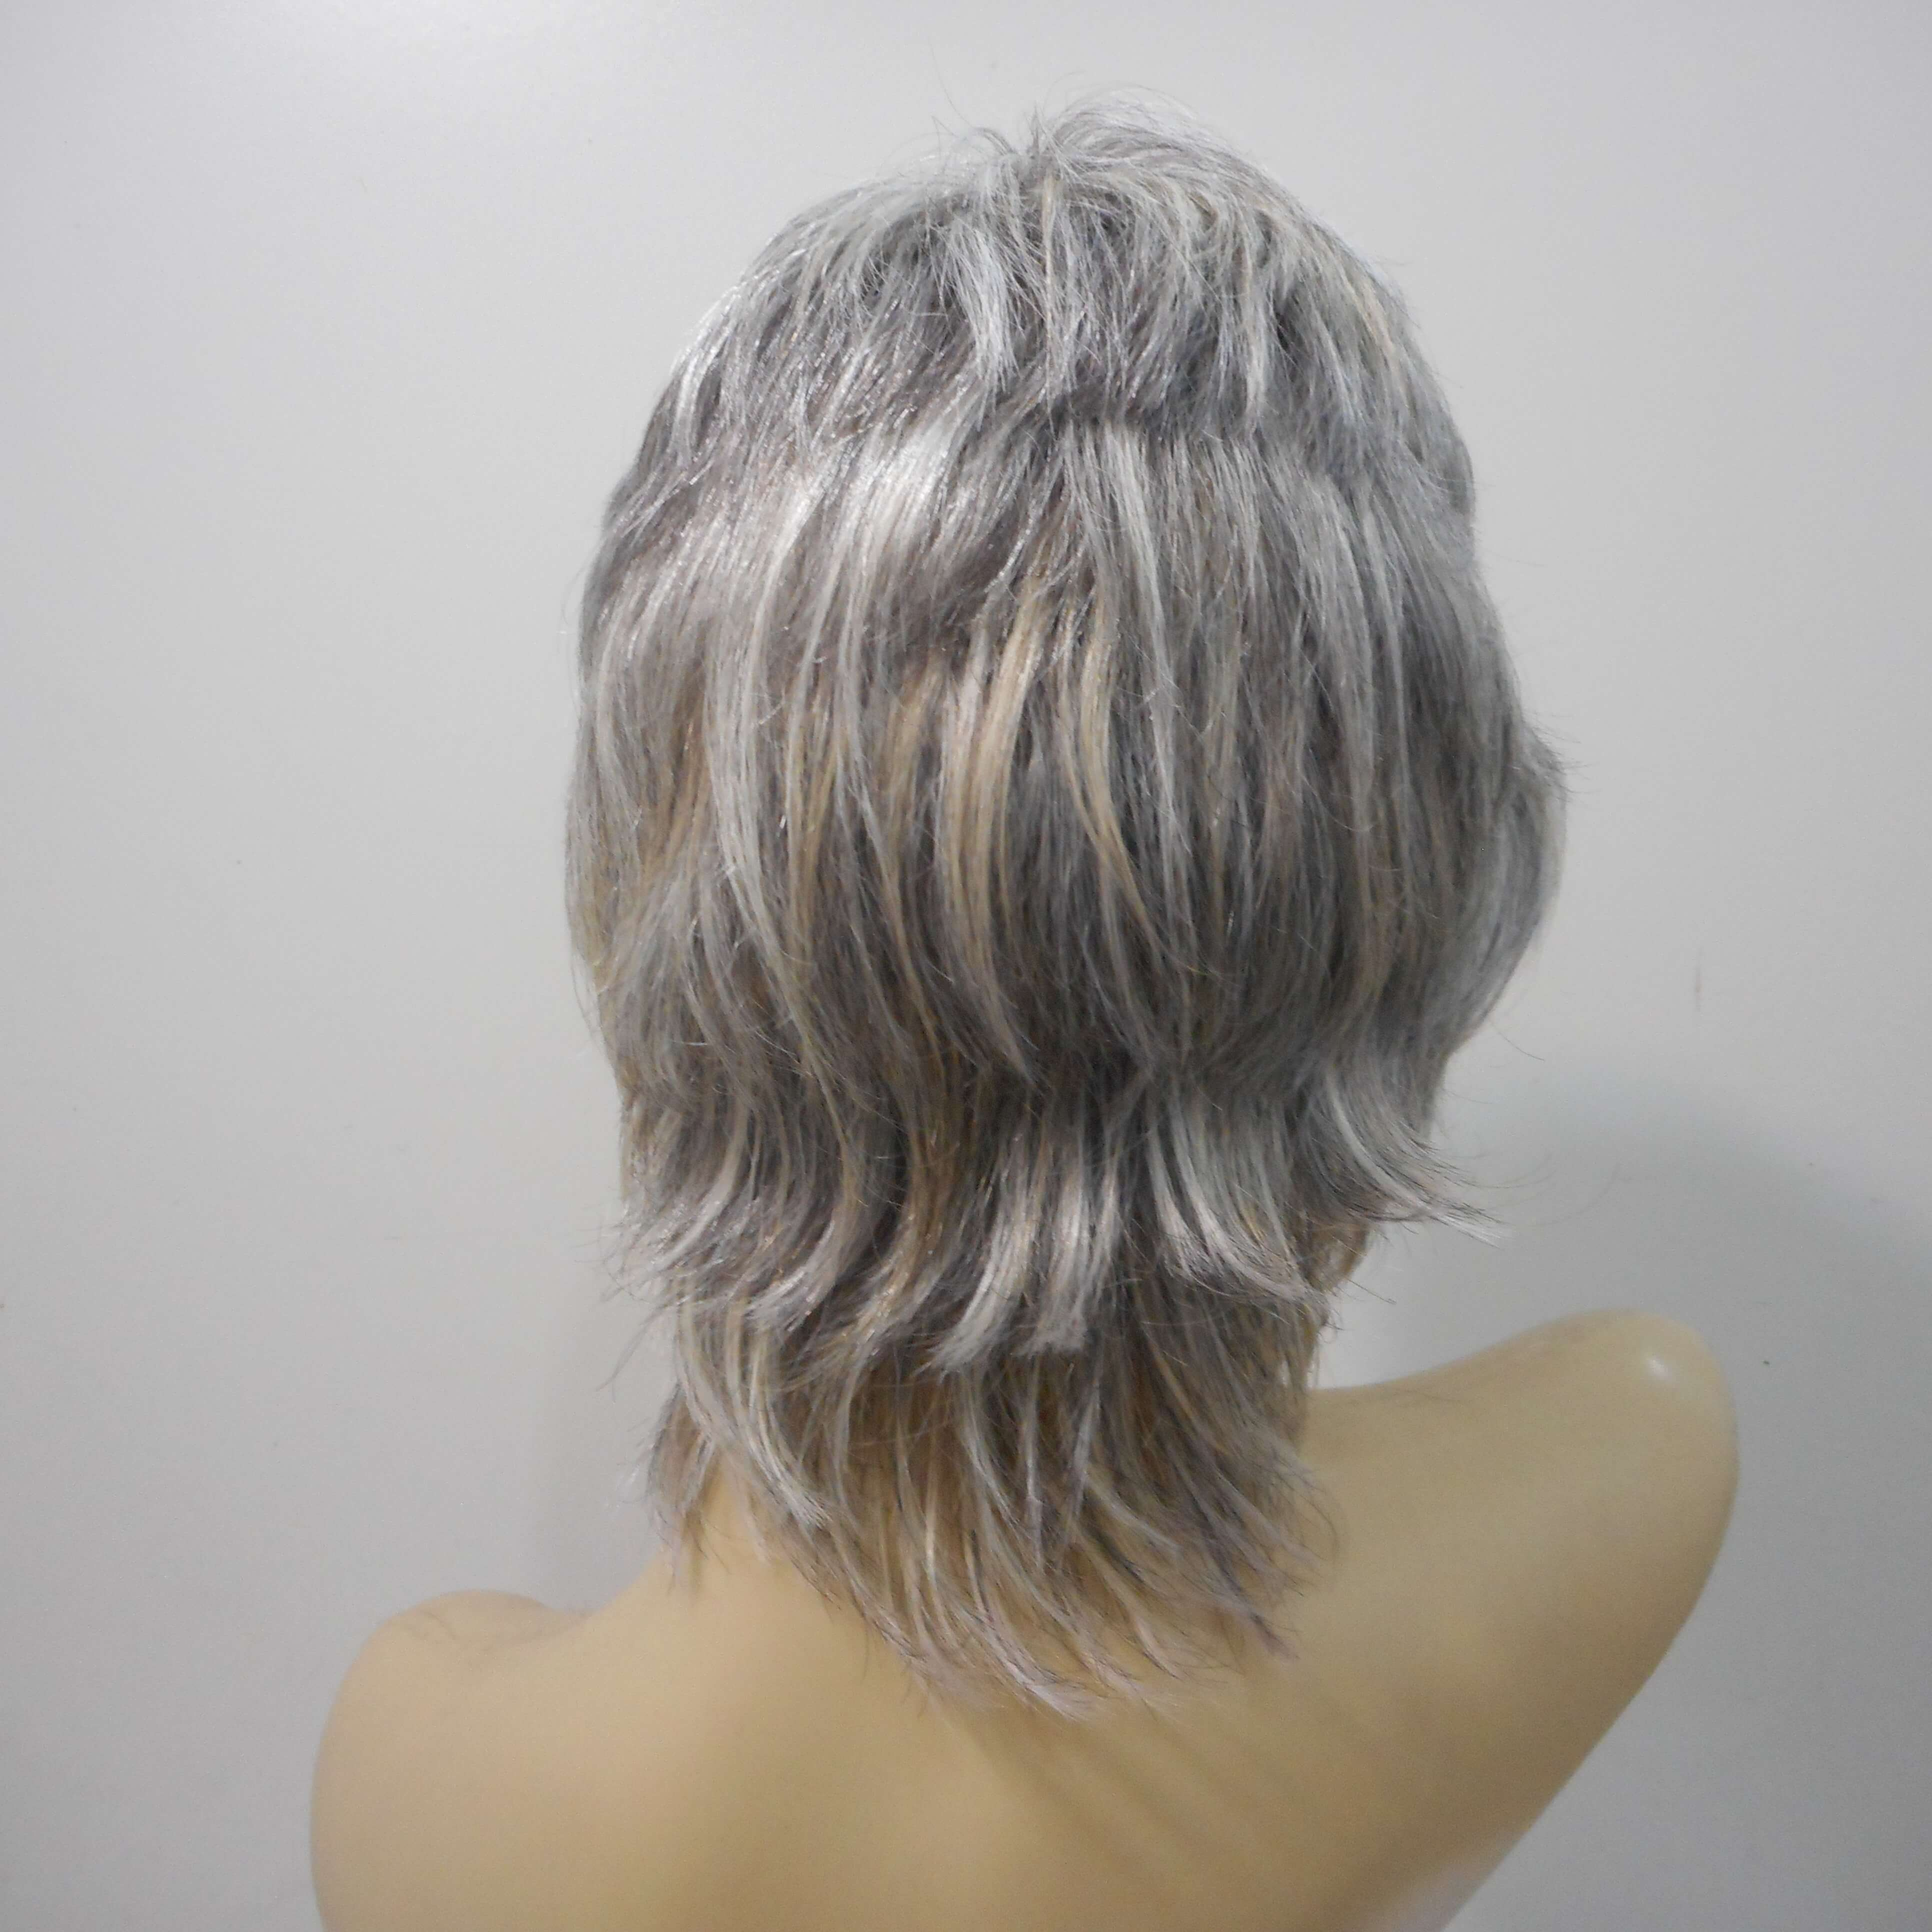 Peruca natural grisalha curta